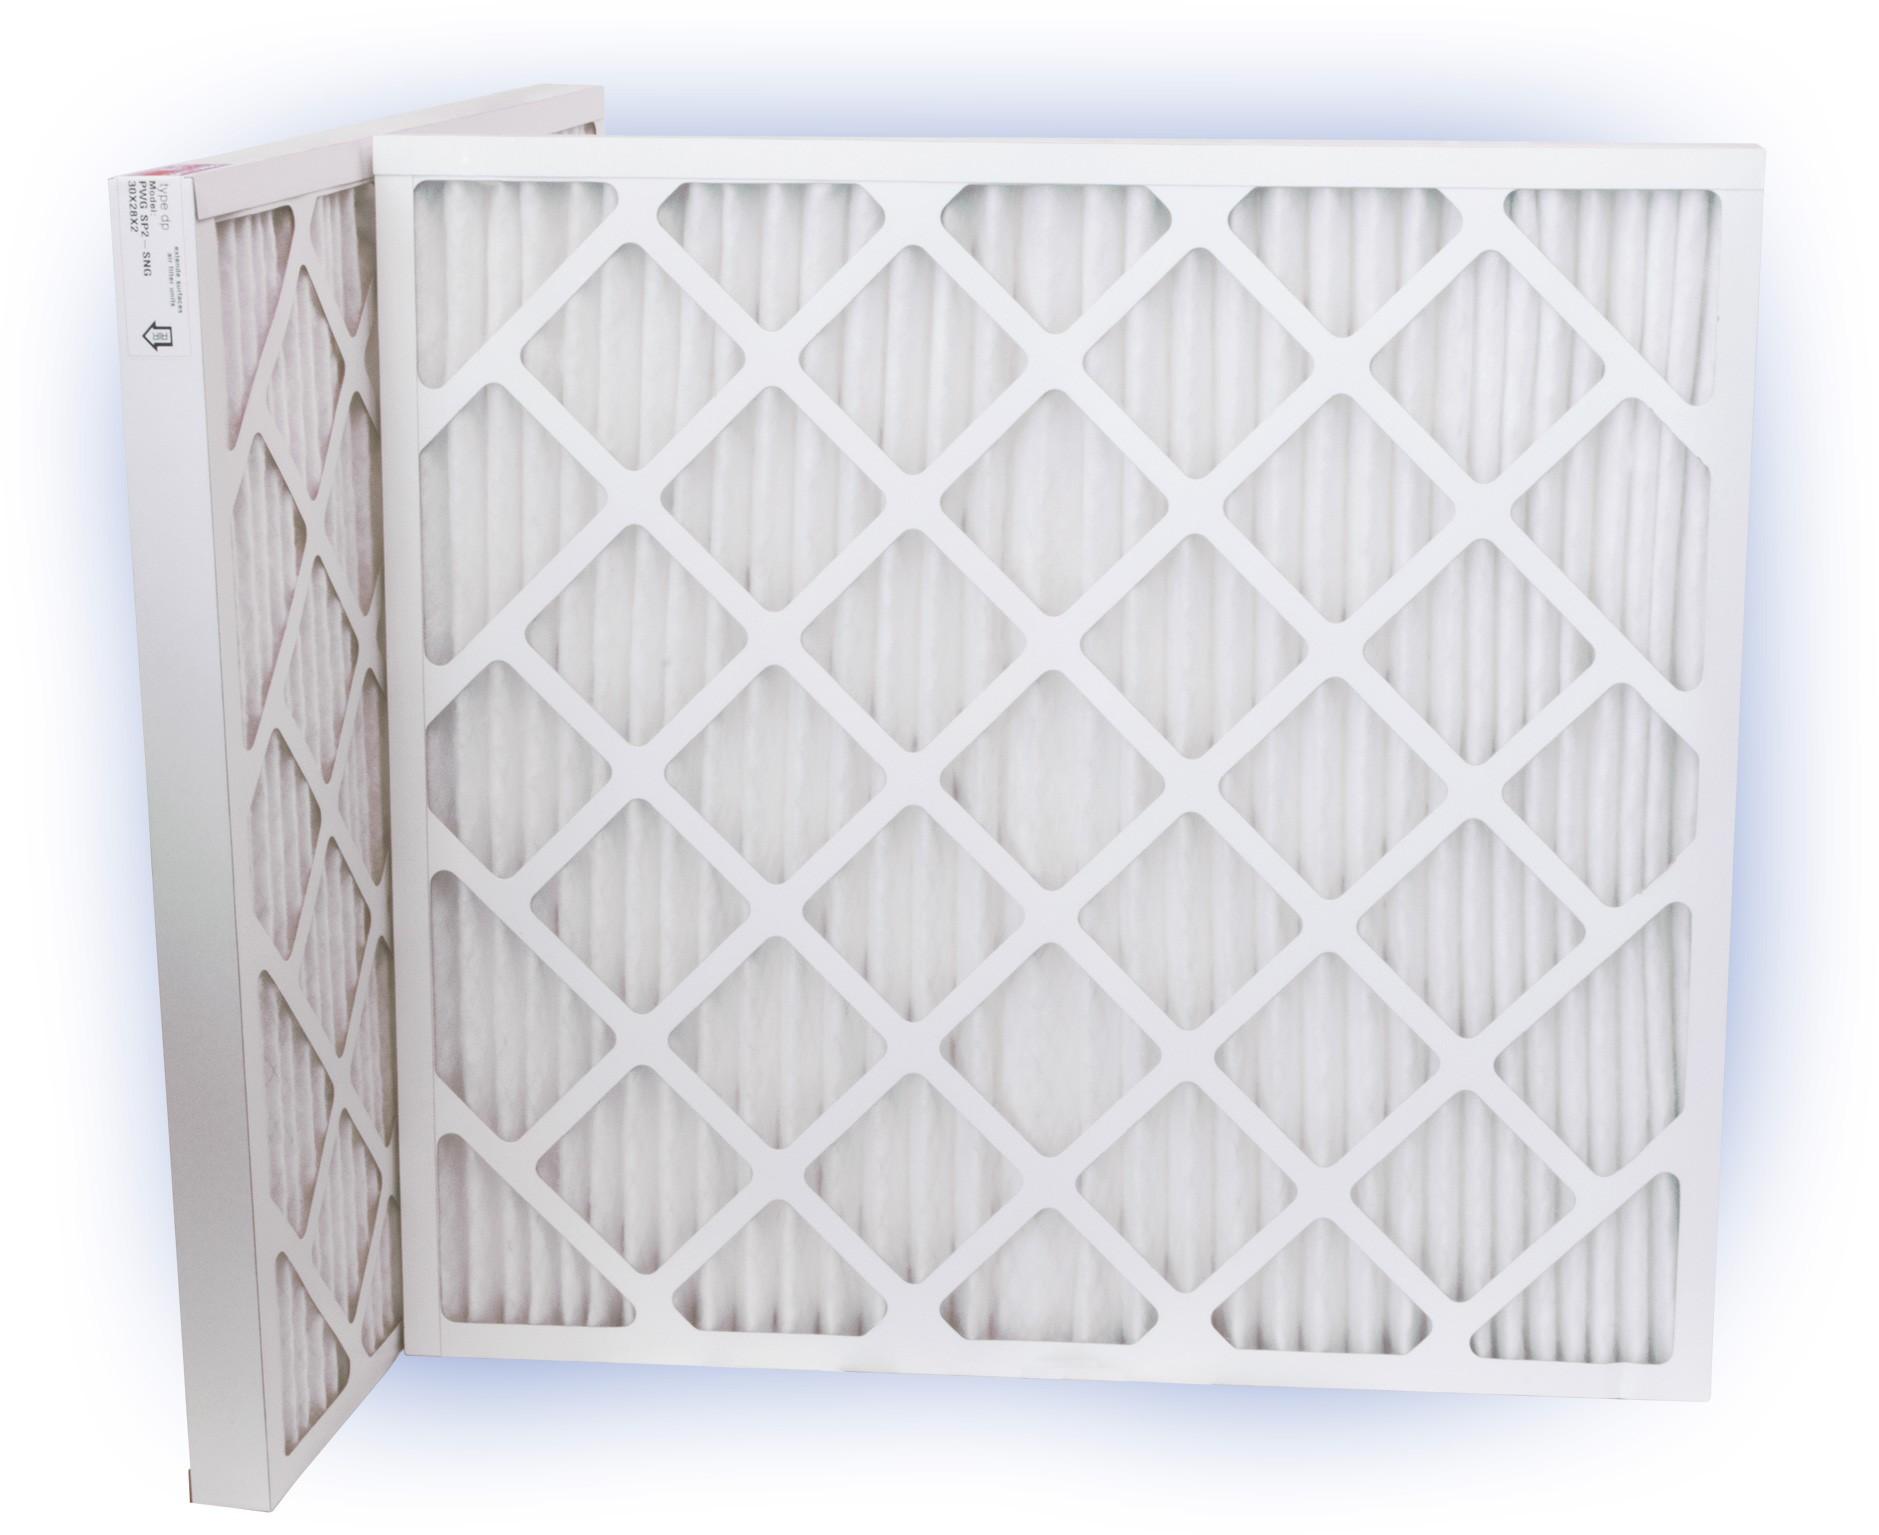 28 x 30 x 2 - PowerGuard Pleated Panel Filter - MERV 11 2-Pack